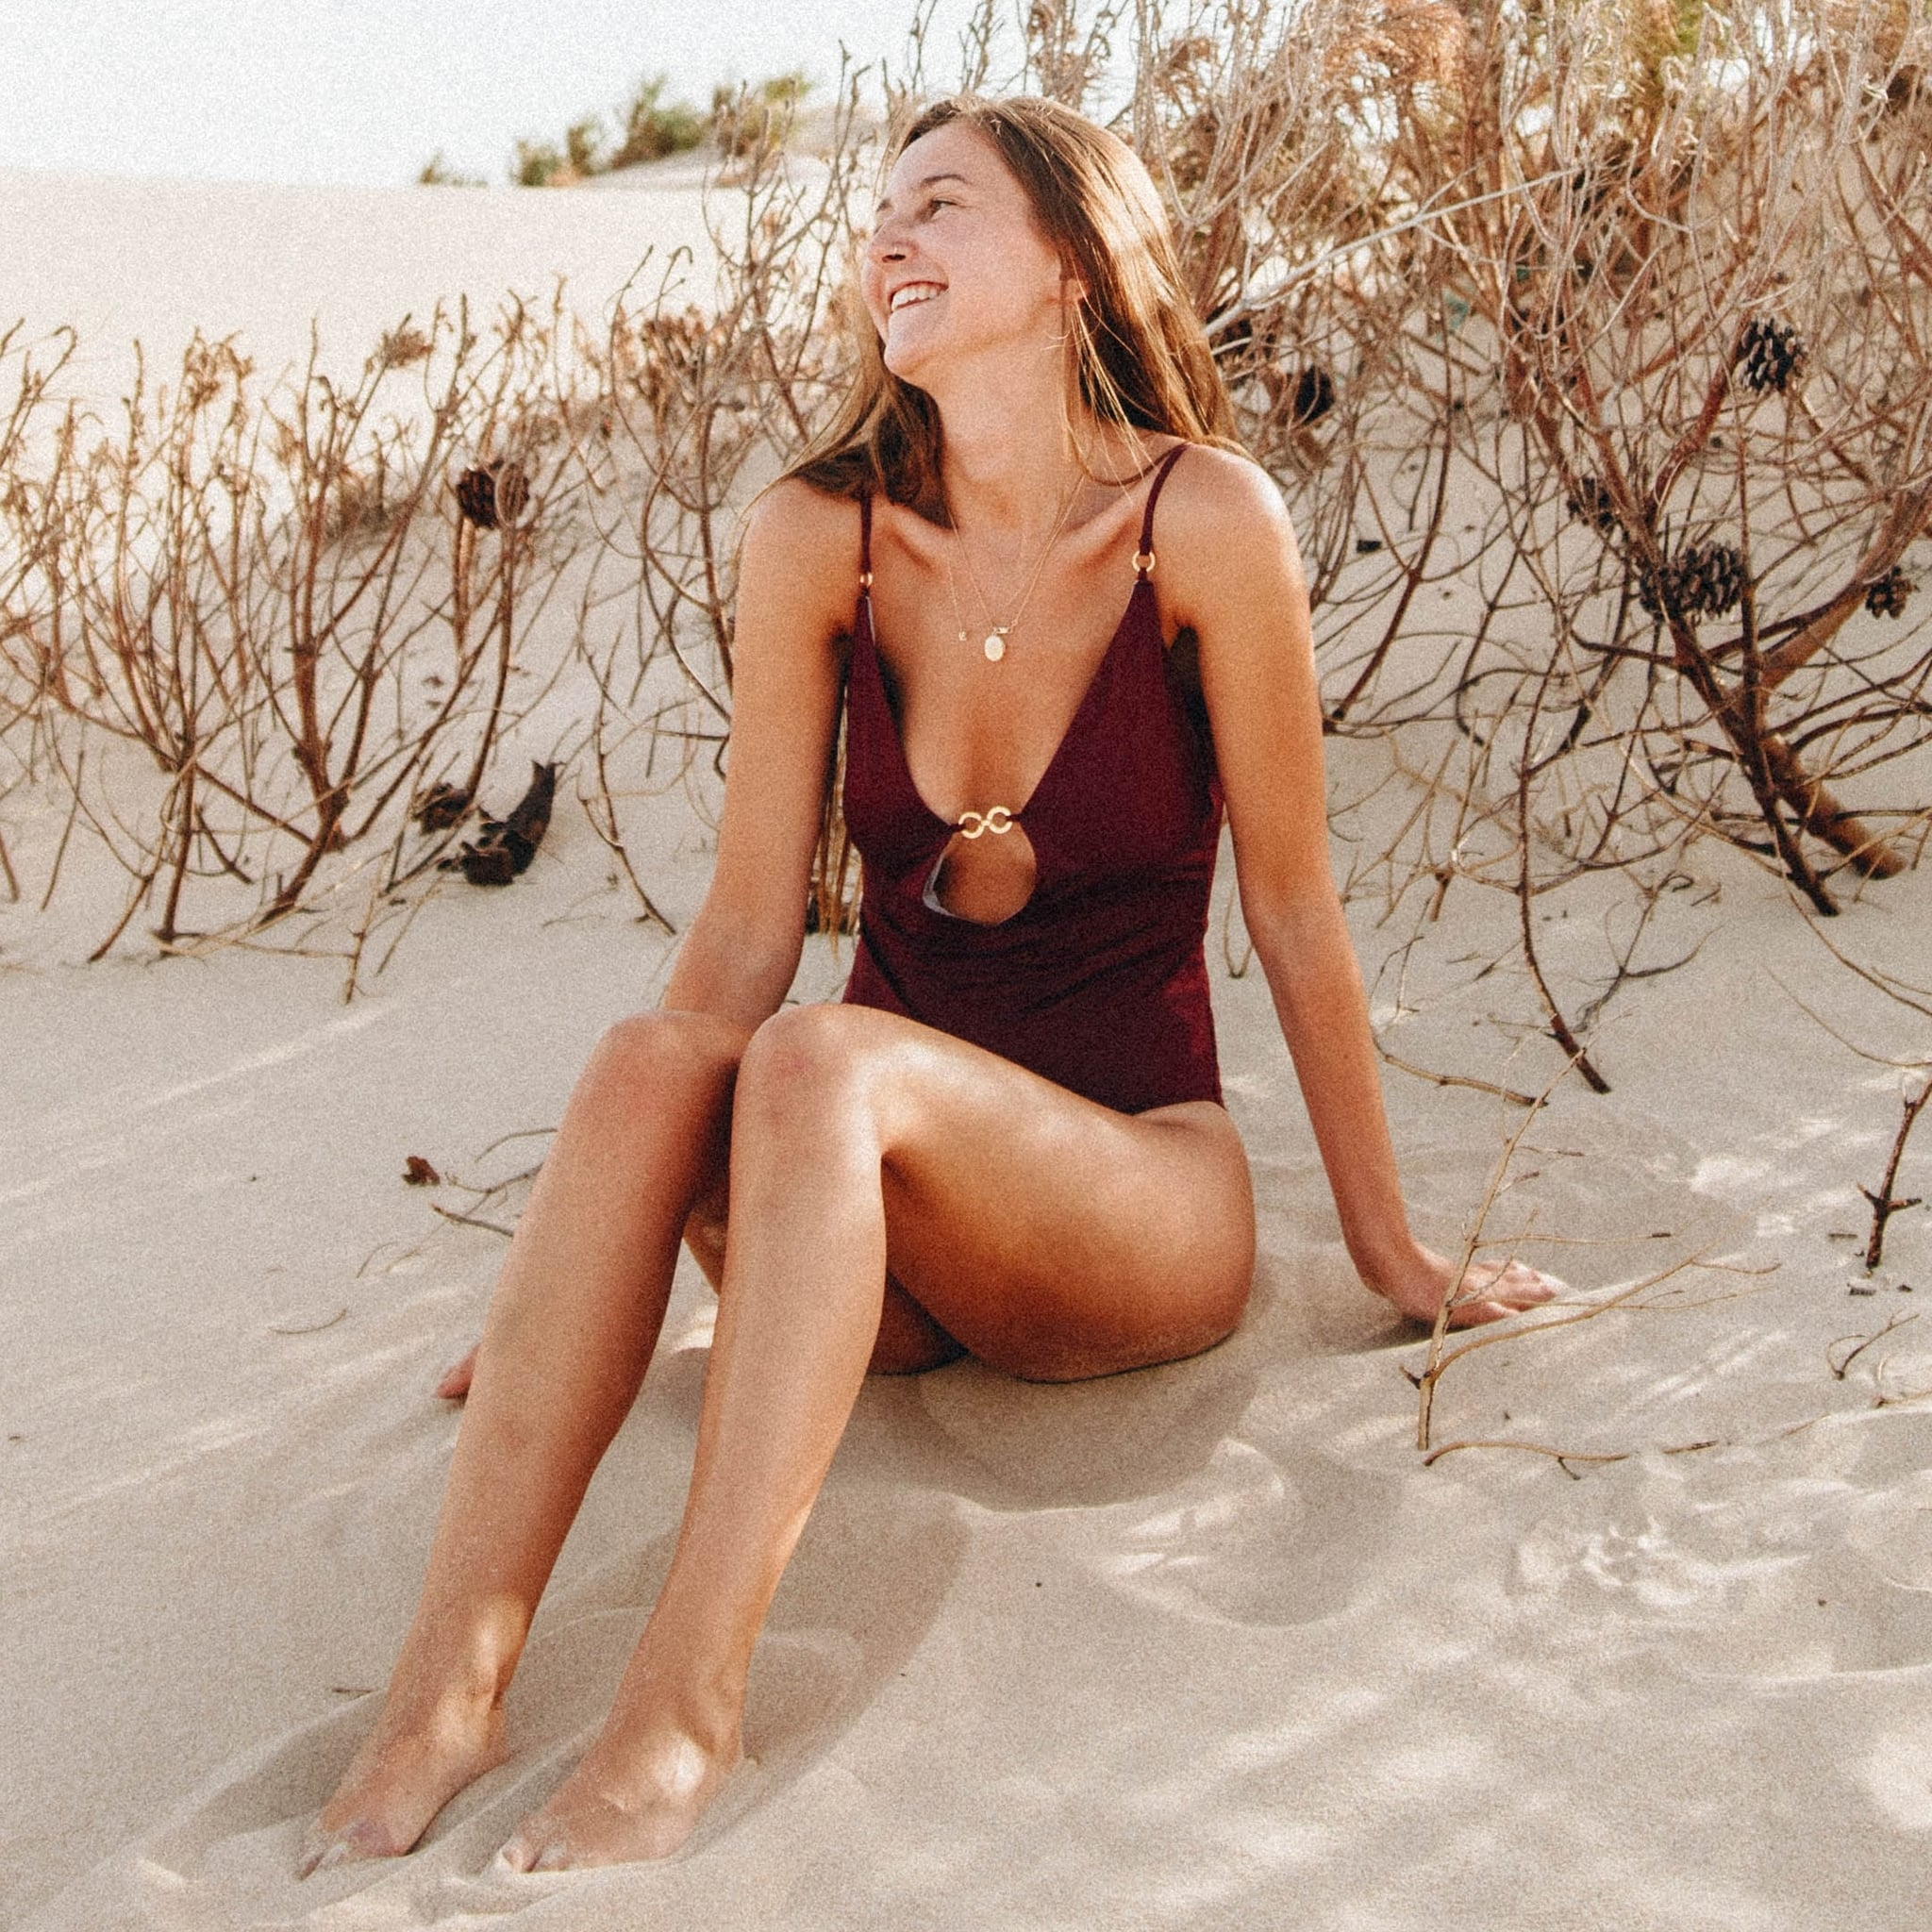 Best diy wax kits popsugar beauty solutioingenieria Images